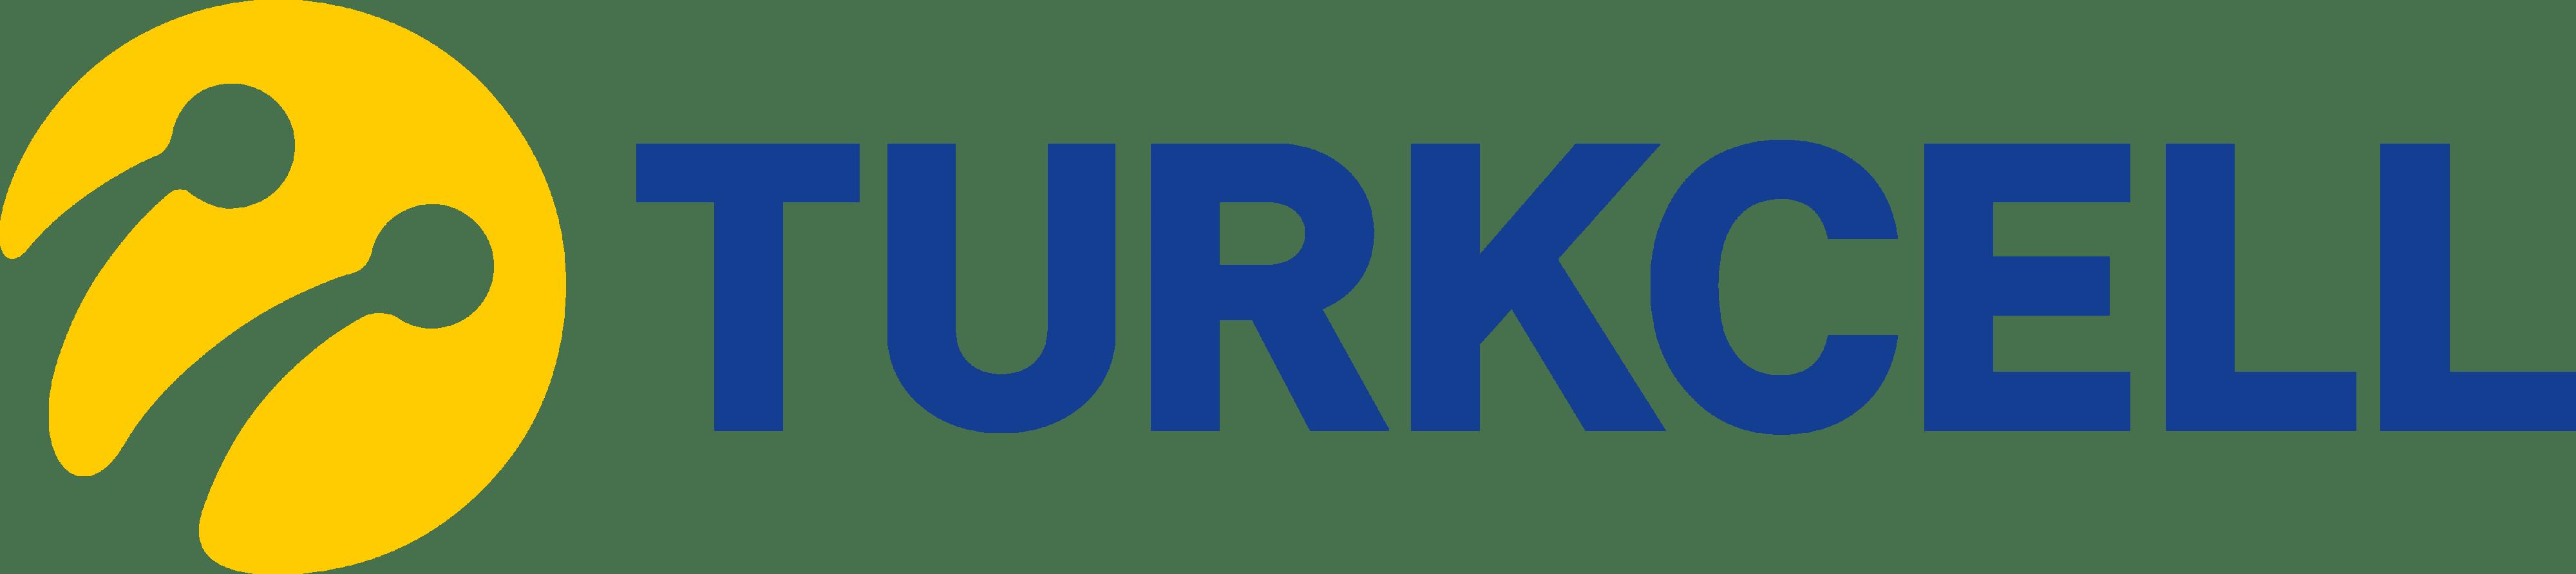 Turkcell Logo png